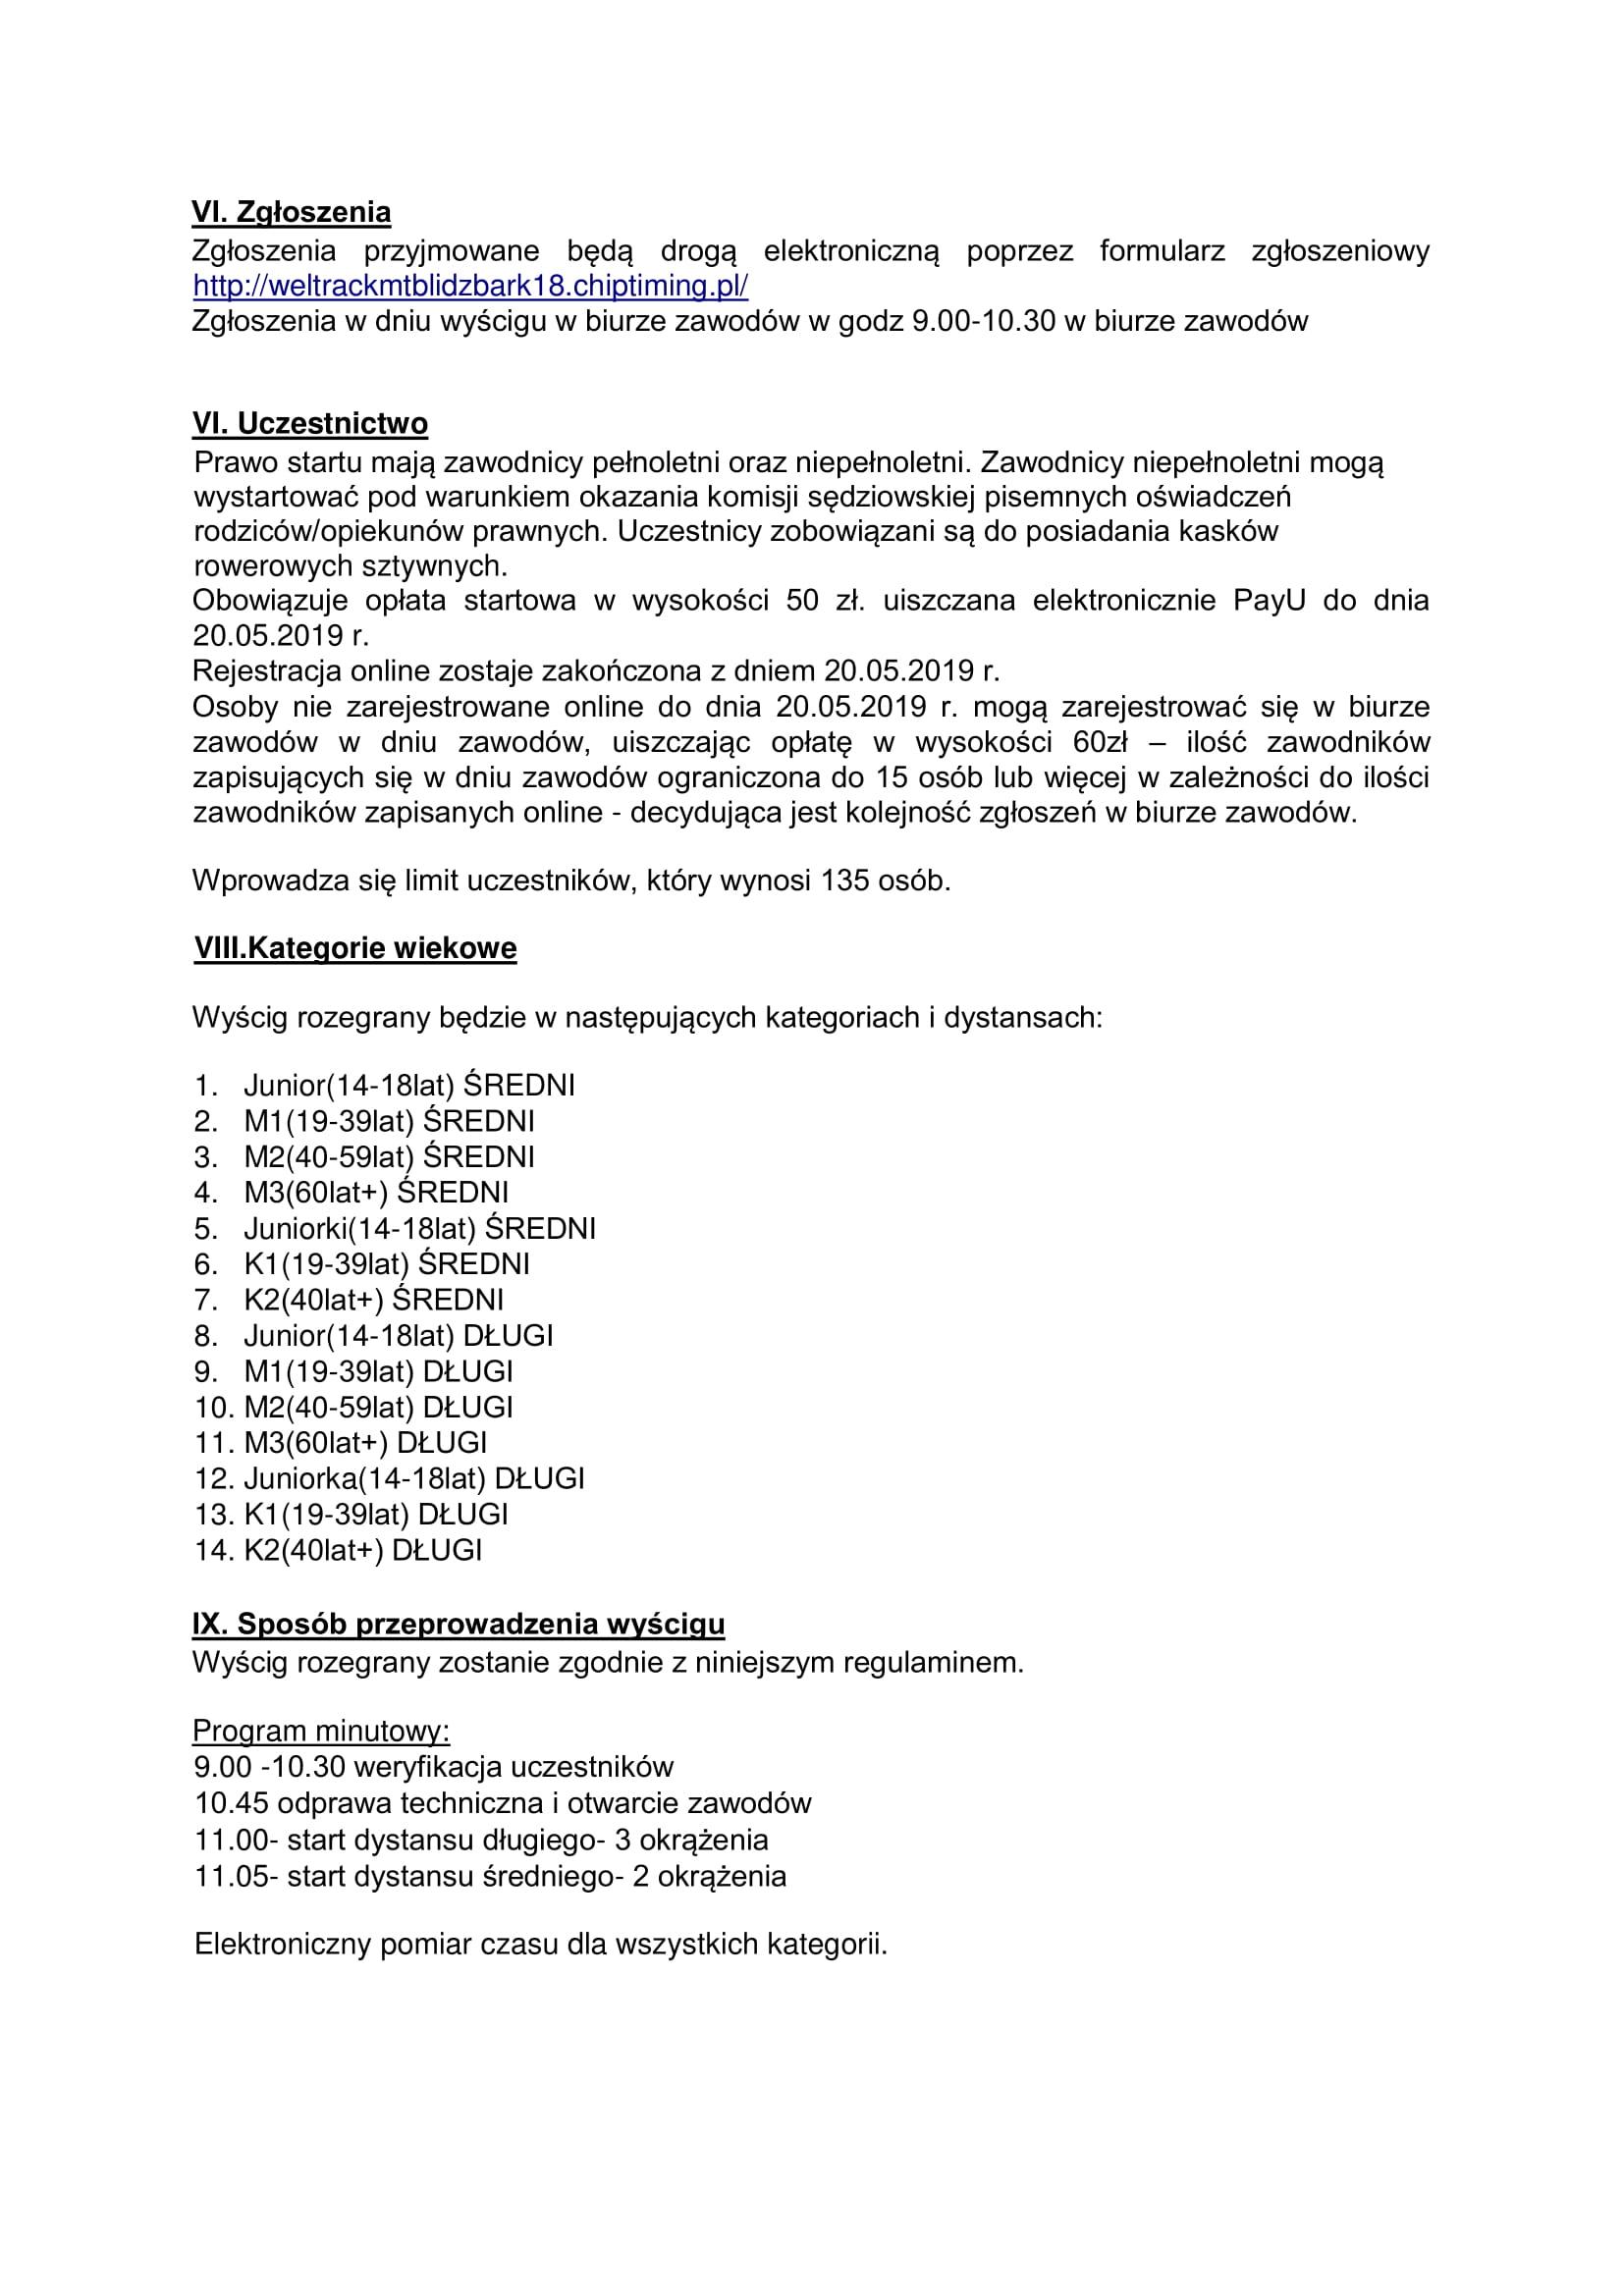 LIDZBARK-WELSKI-WELTRACK-MTB-MARATON-REGULAMIN-2018-12-2